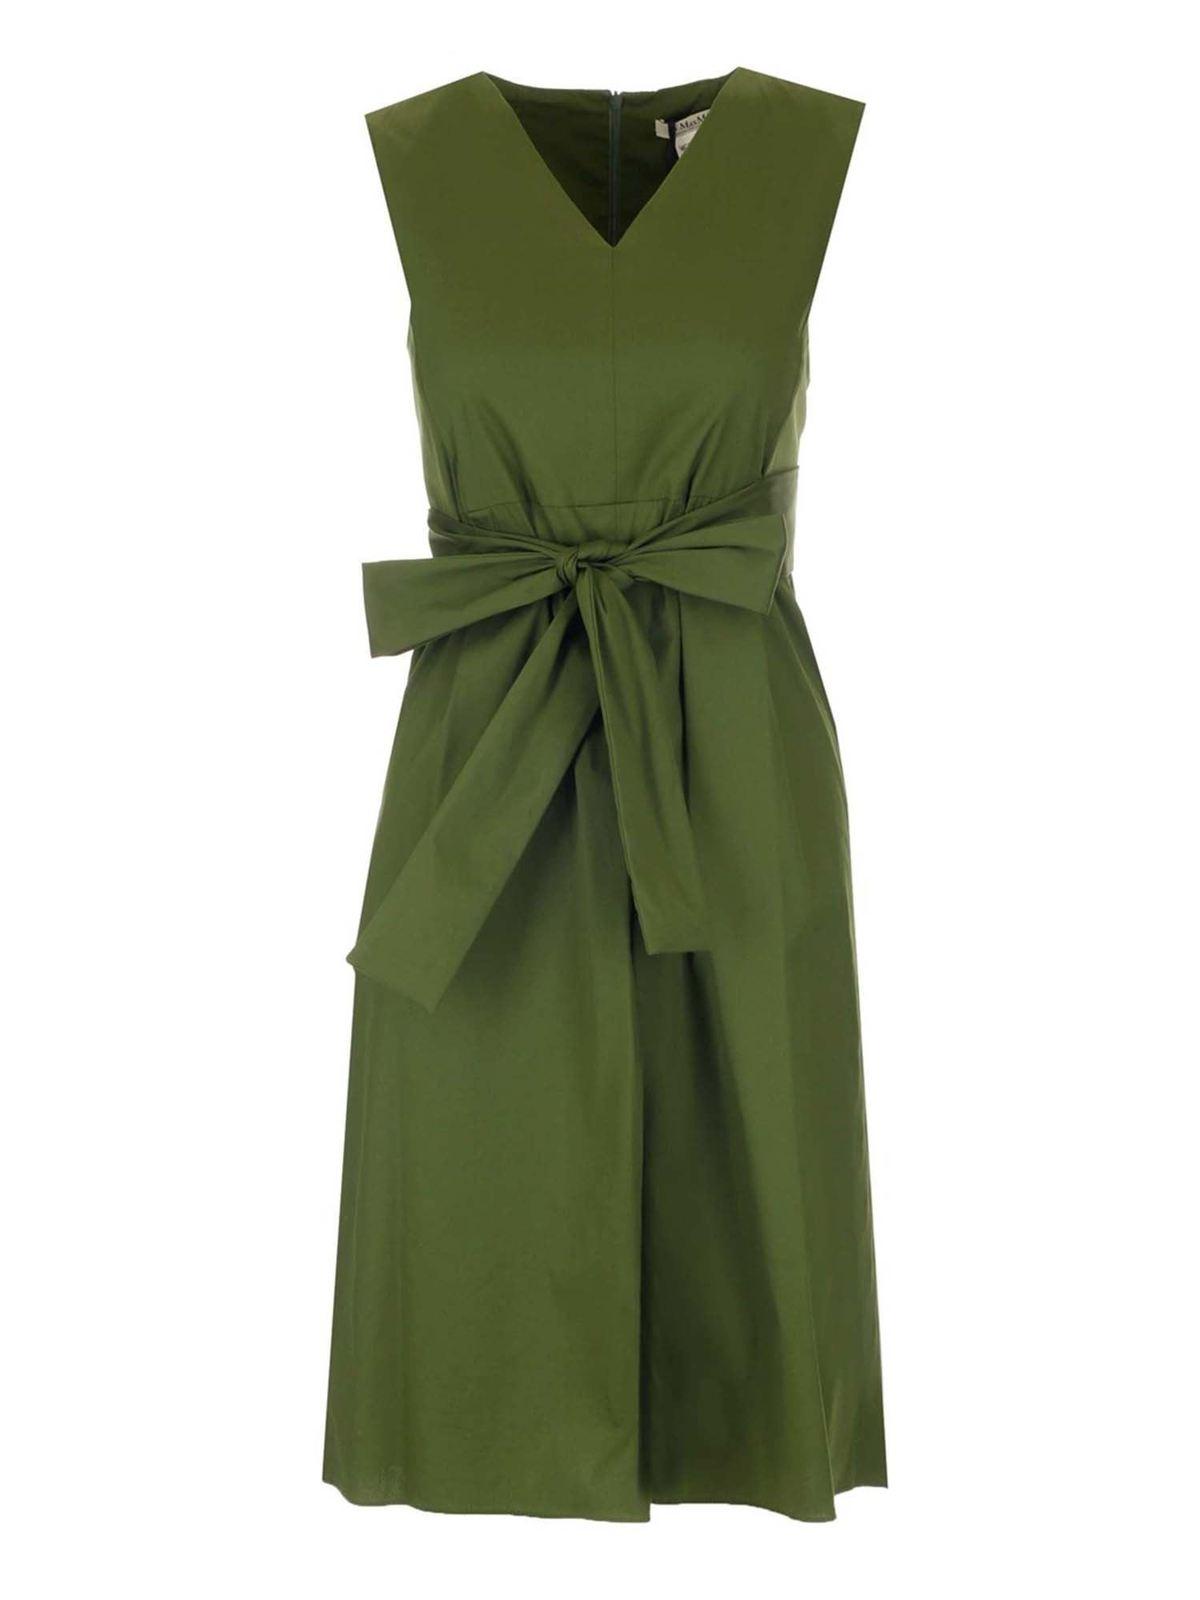 Max Mara Cottons ESTREMO SLEEVELESS DRESS IN GREEN